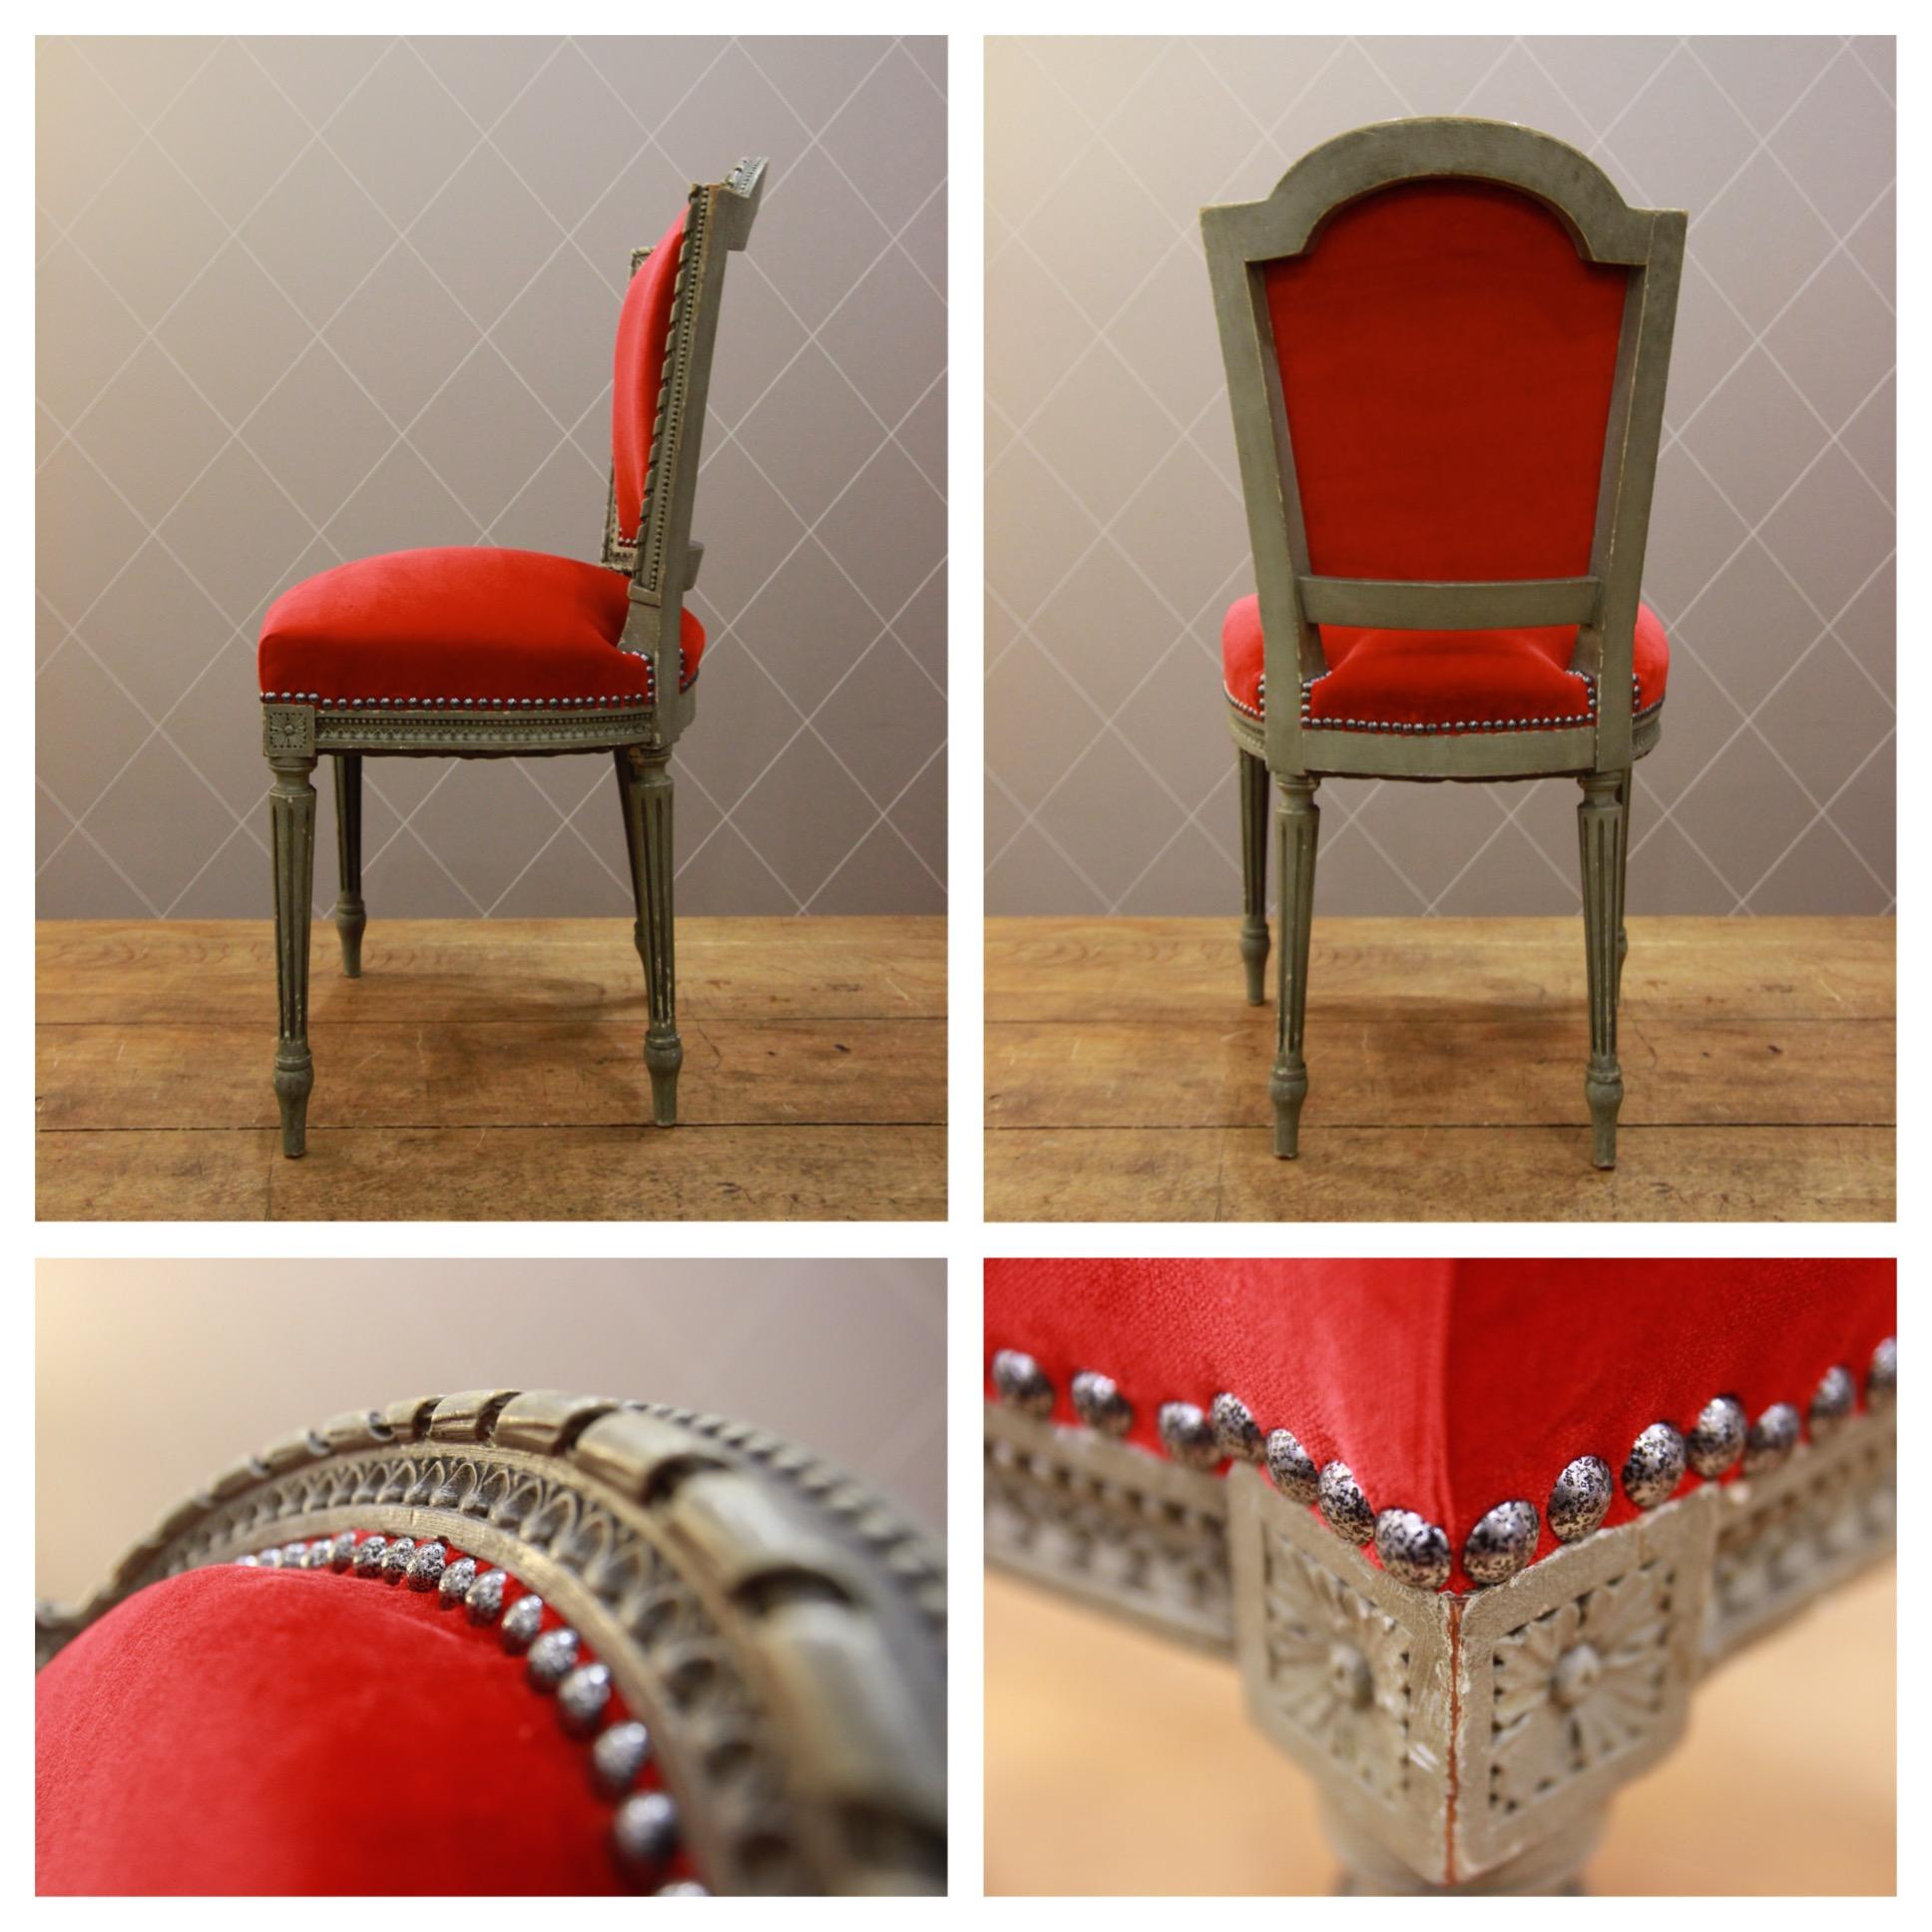 chaise louis xvi en velours rouge atelier md2atelier md2. Black Bedroom Furniture Sets. Home Design Ideas